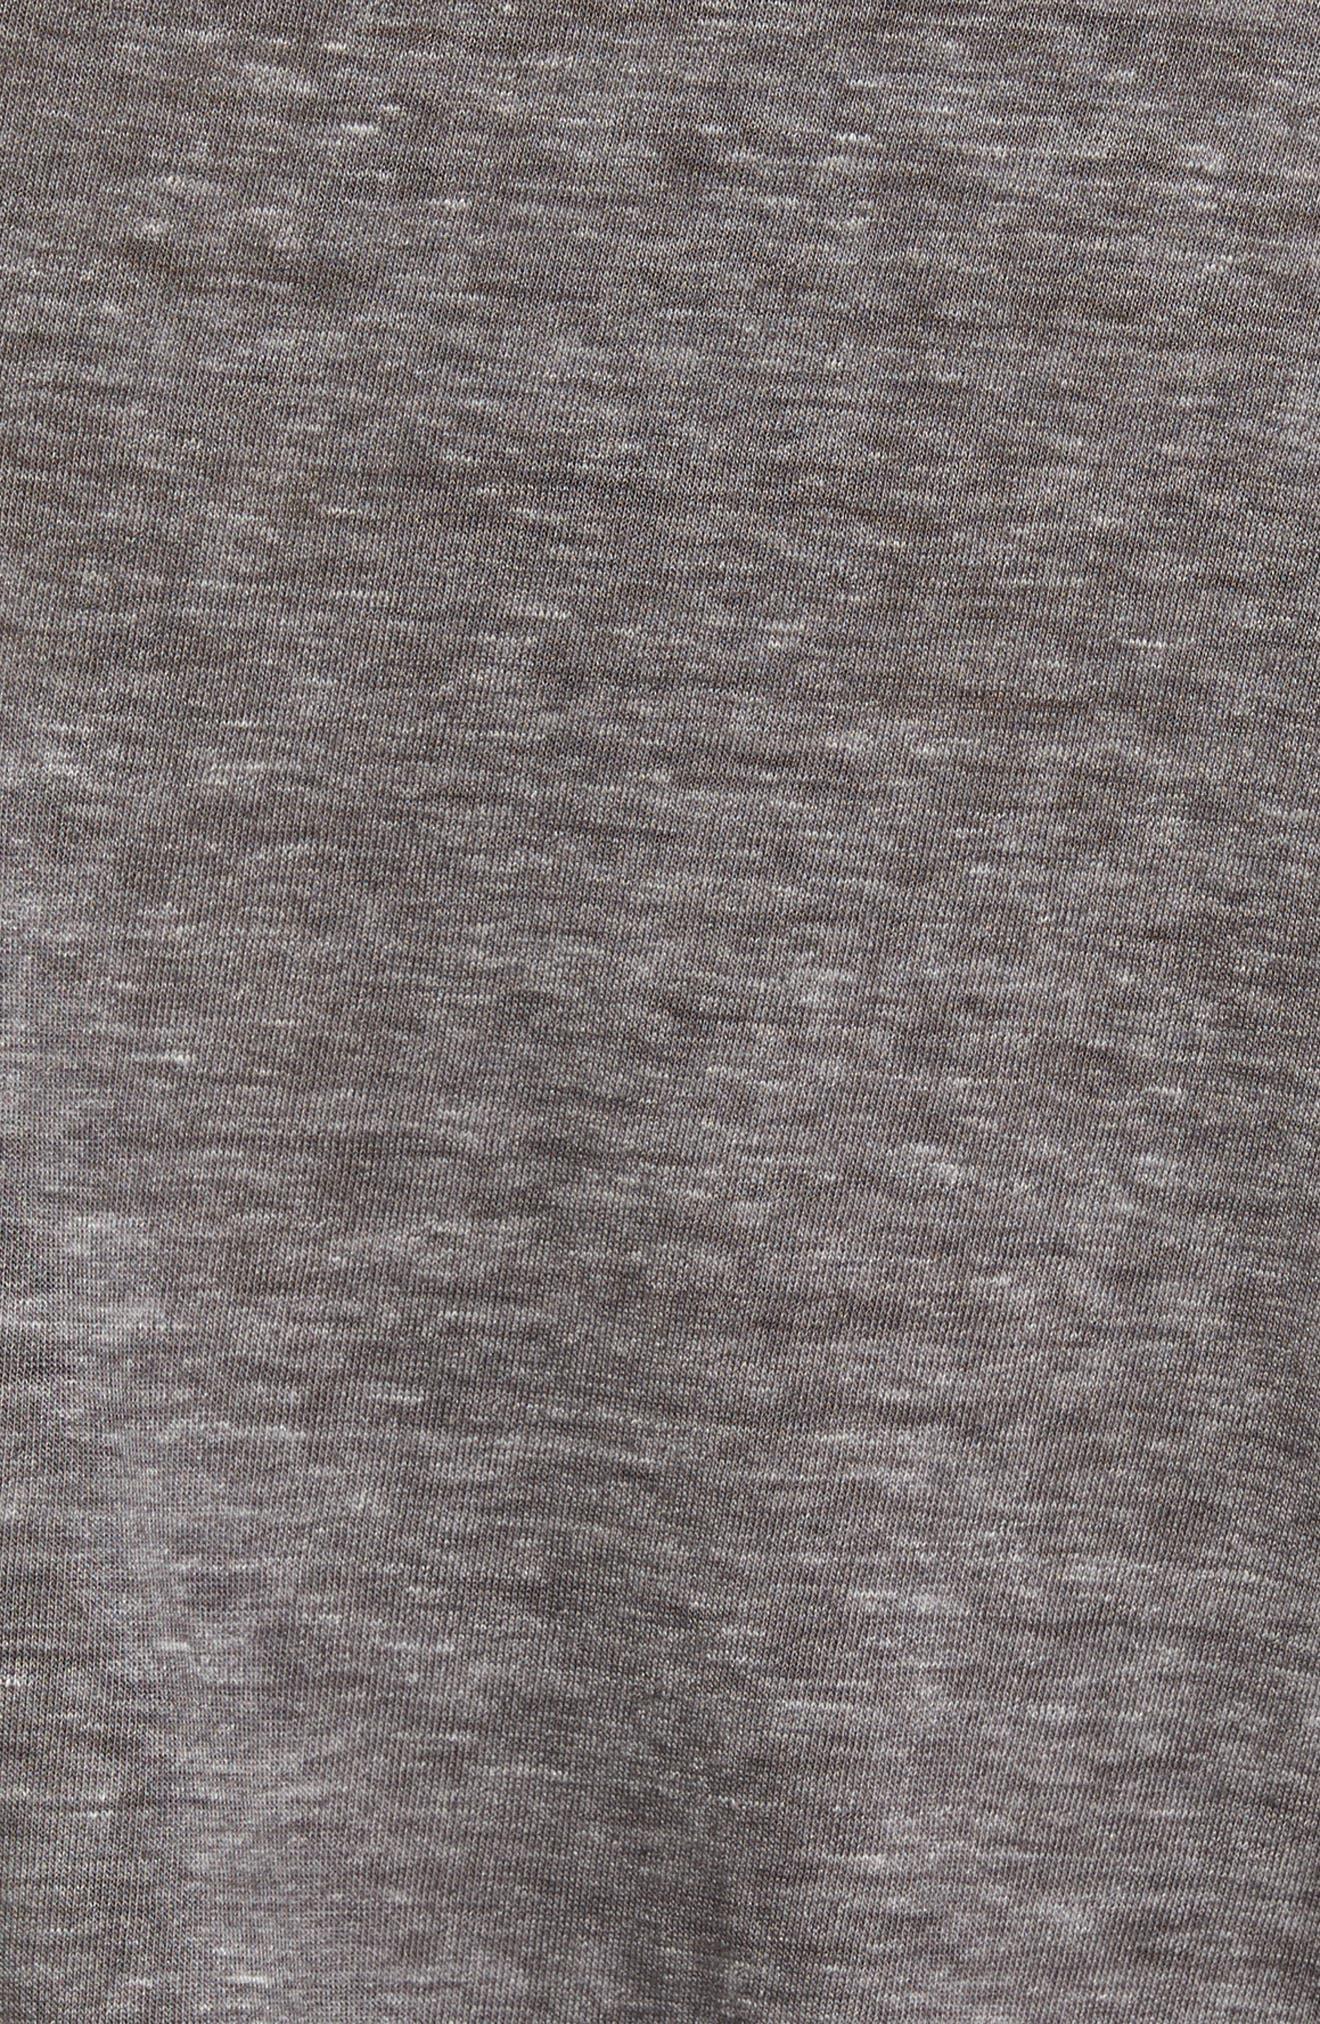 Balance Process T-Shirt,                             Alternate thumbnail 5, color,                             051